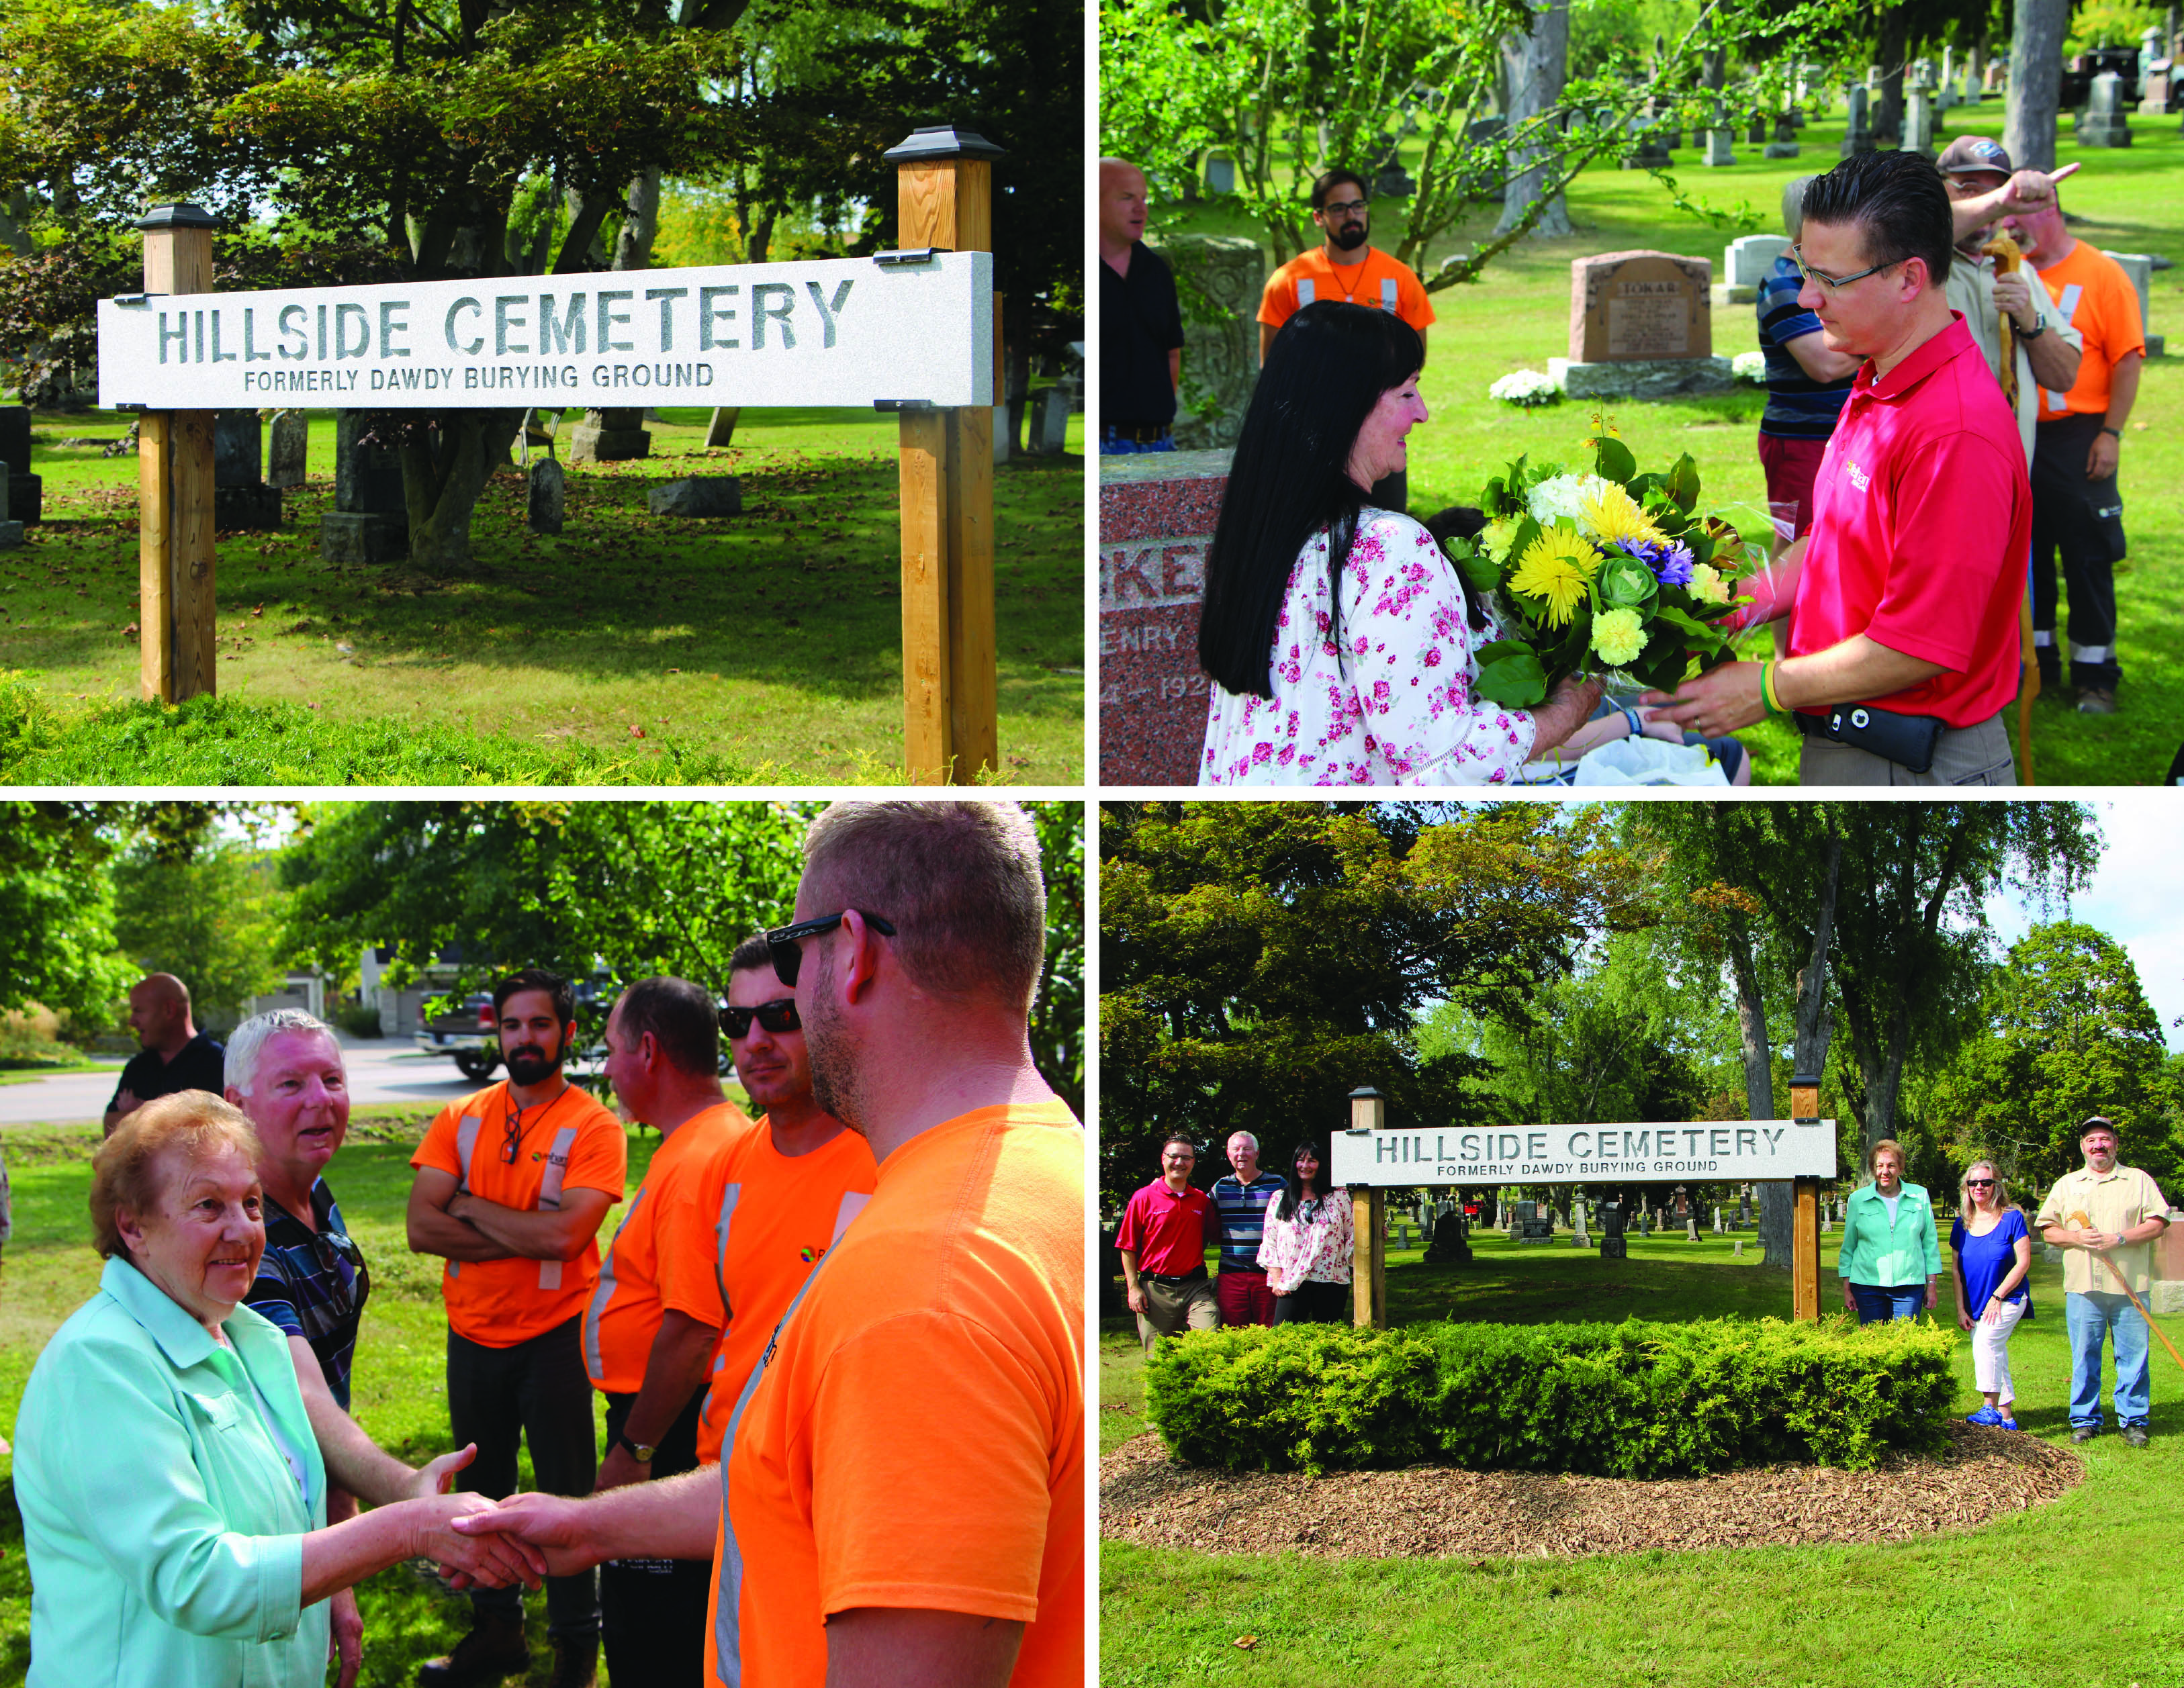 hillside cemetery photo group